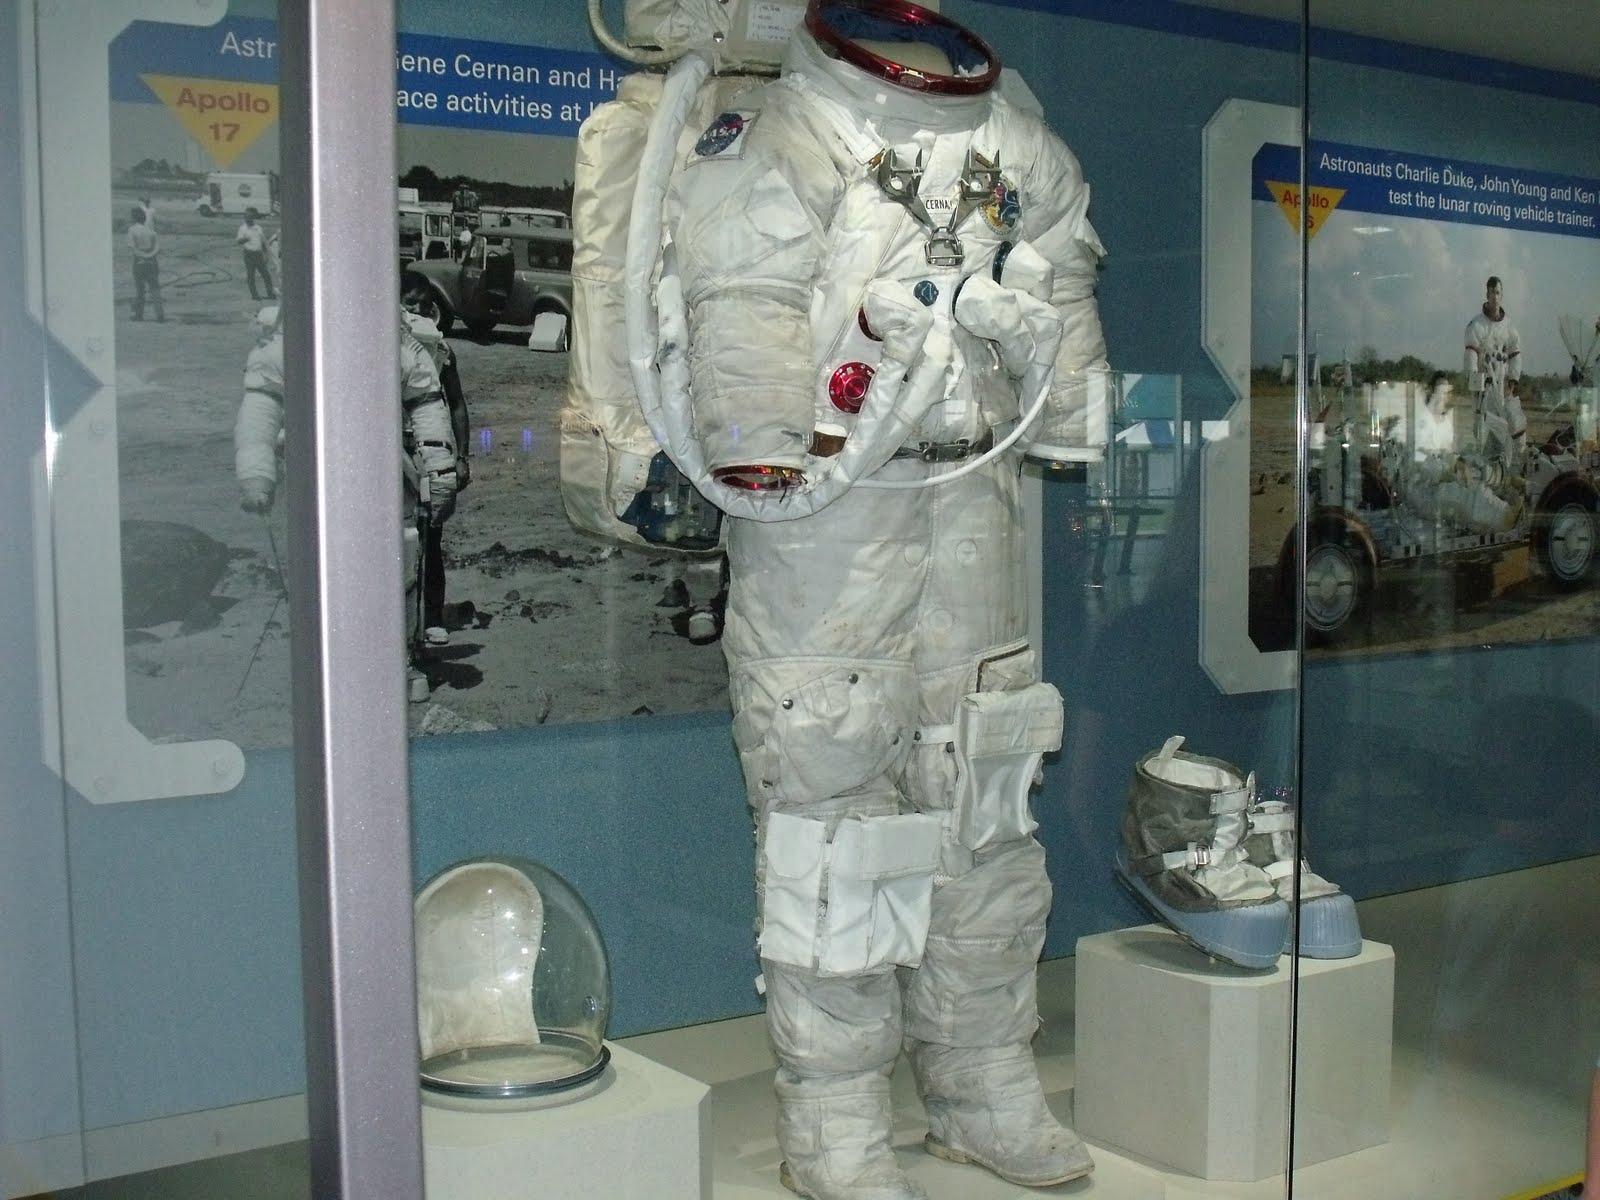 apollo 11 space suit boots - photo #11